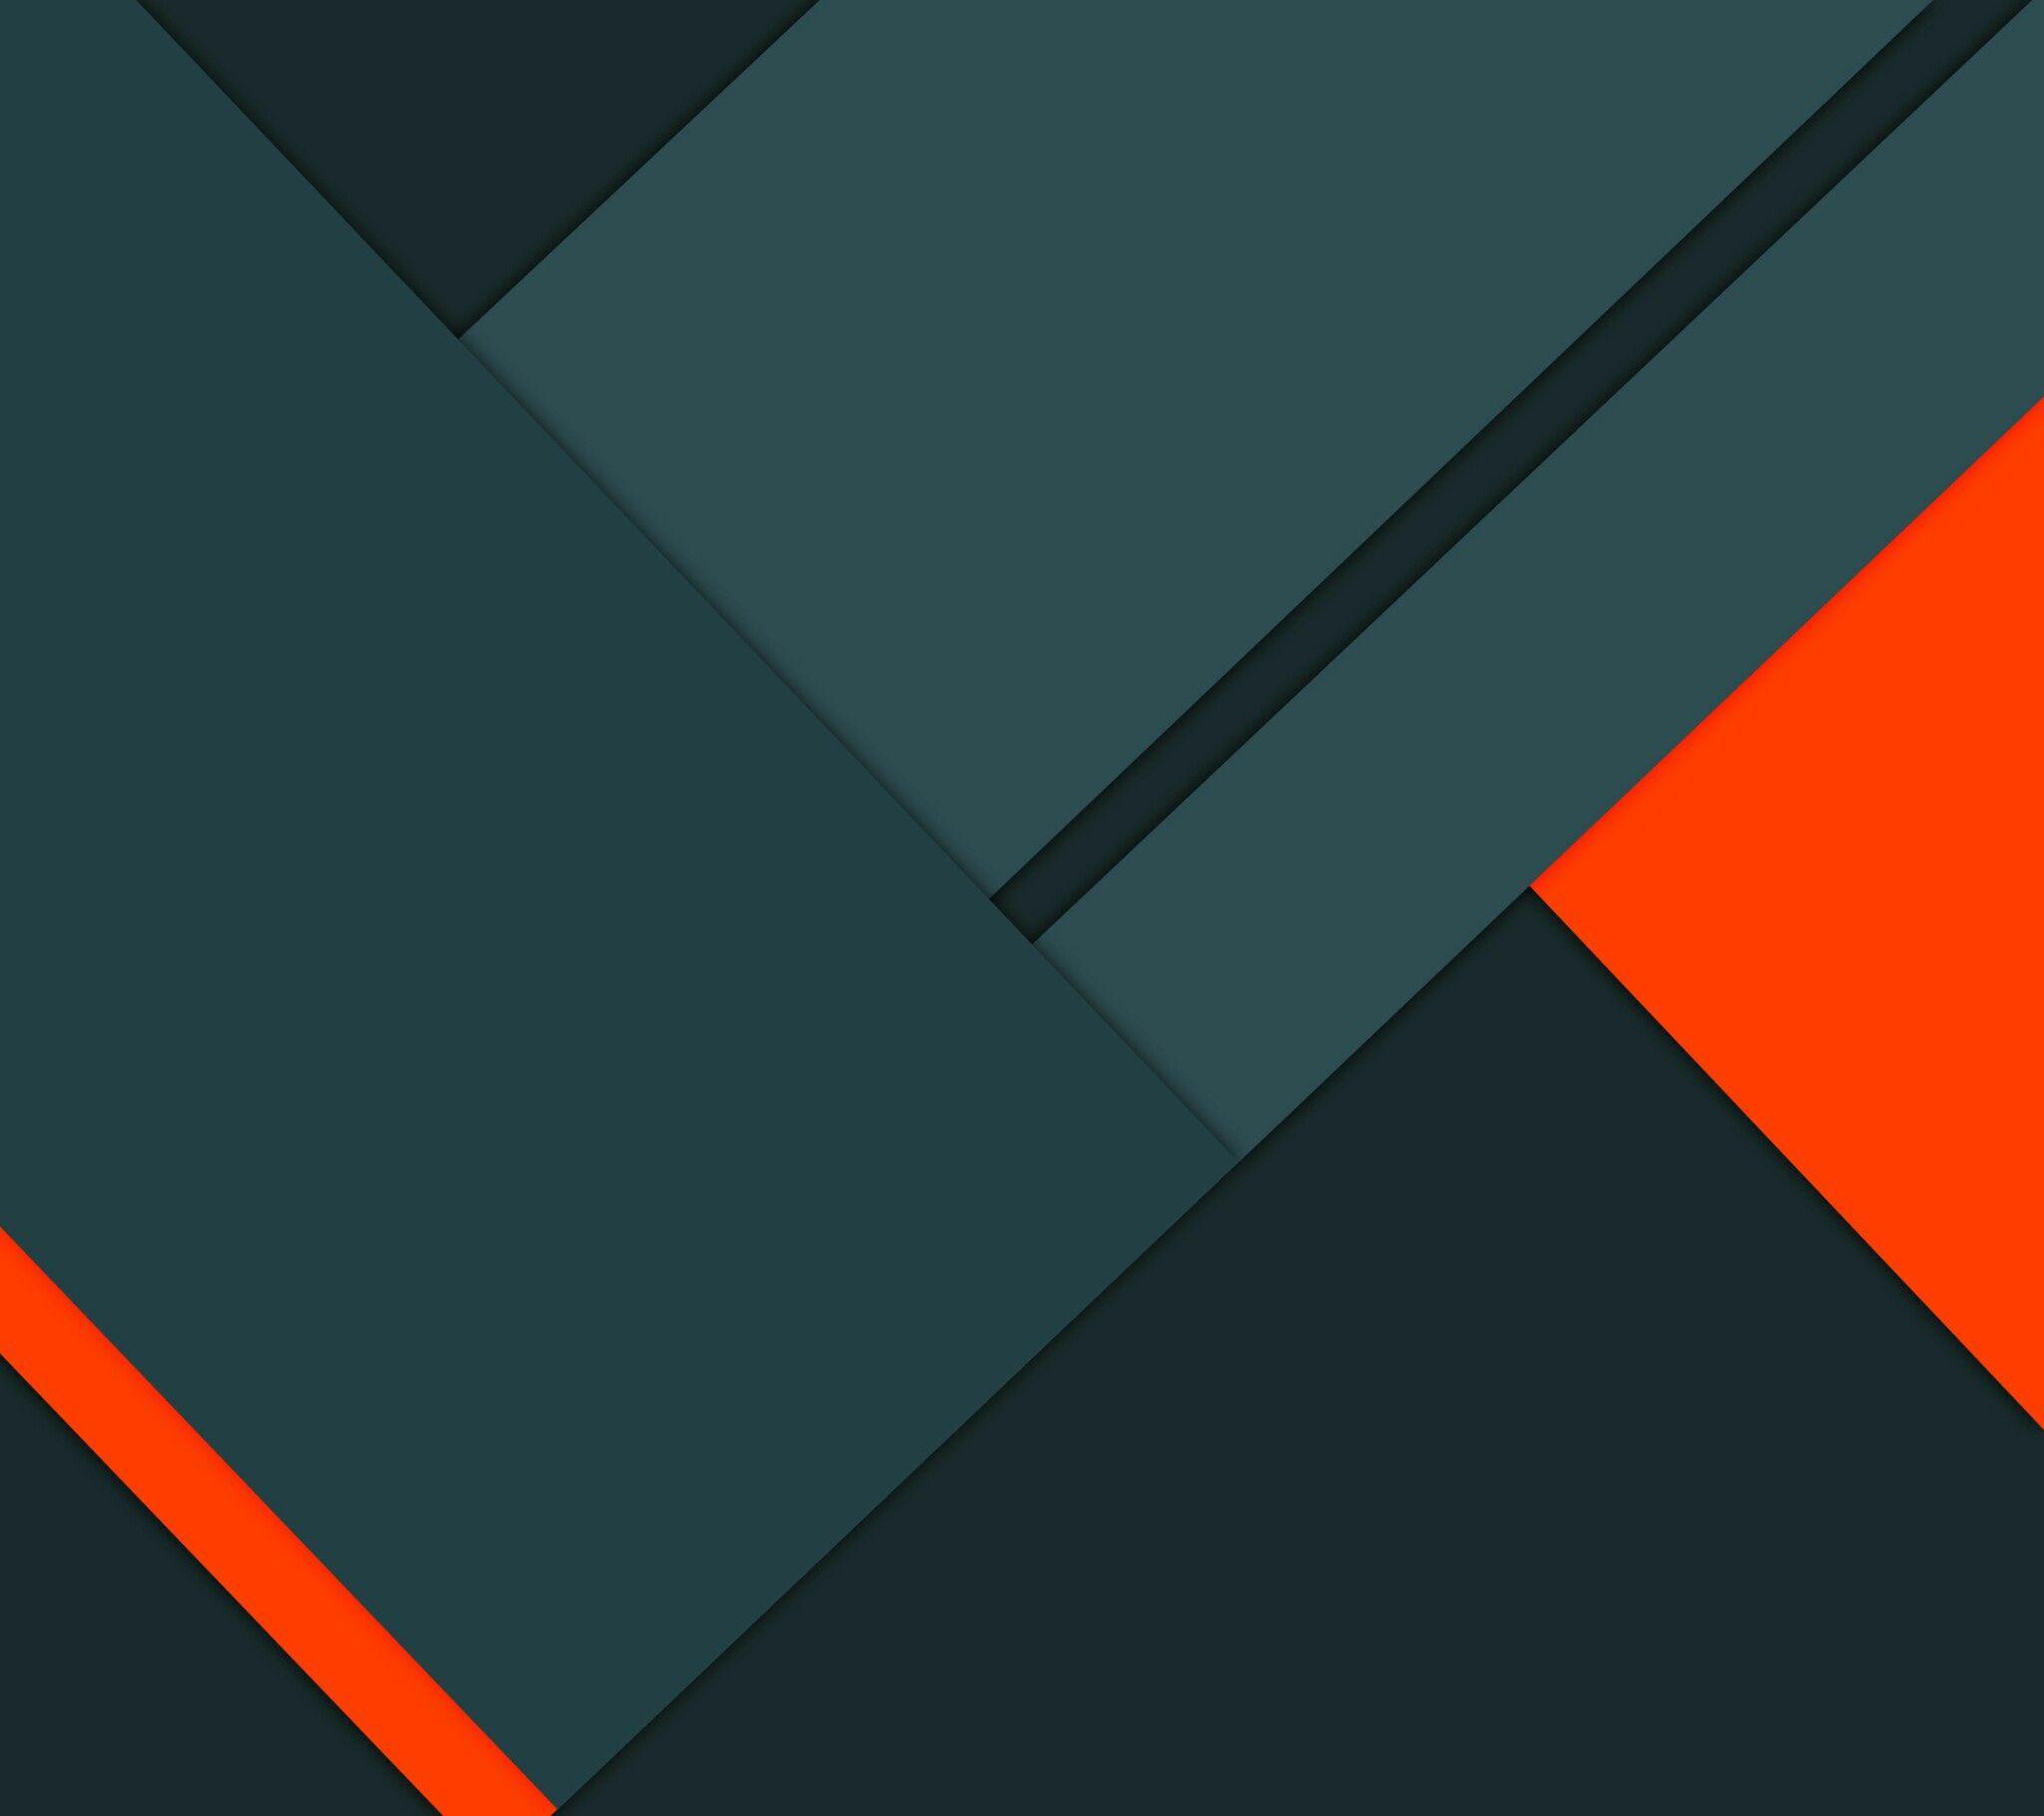 android material wallpaper  Materials Wallpapers - Wallpaper Cave